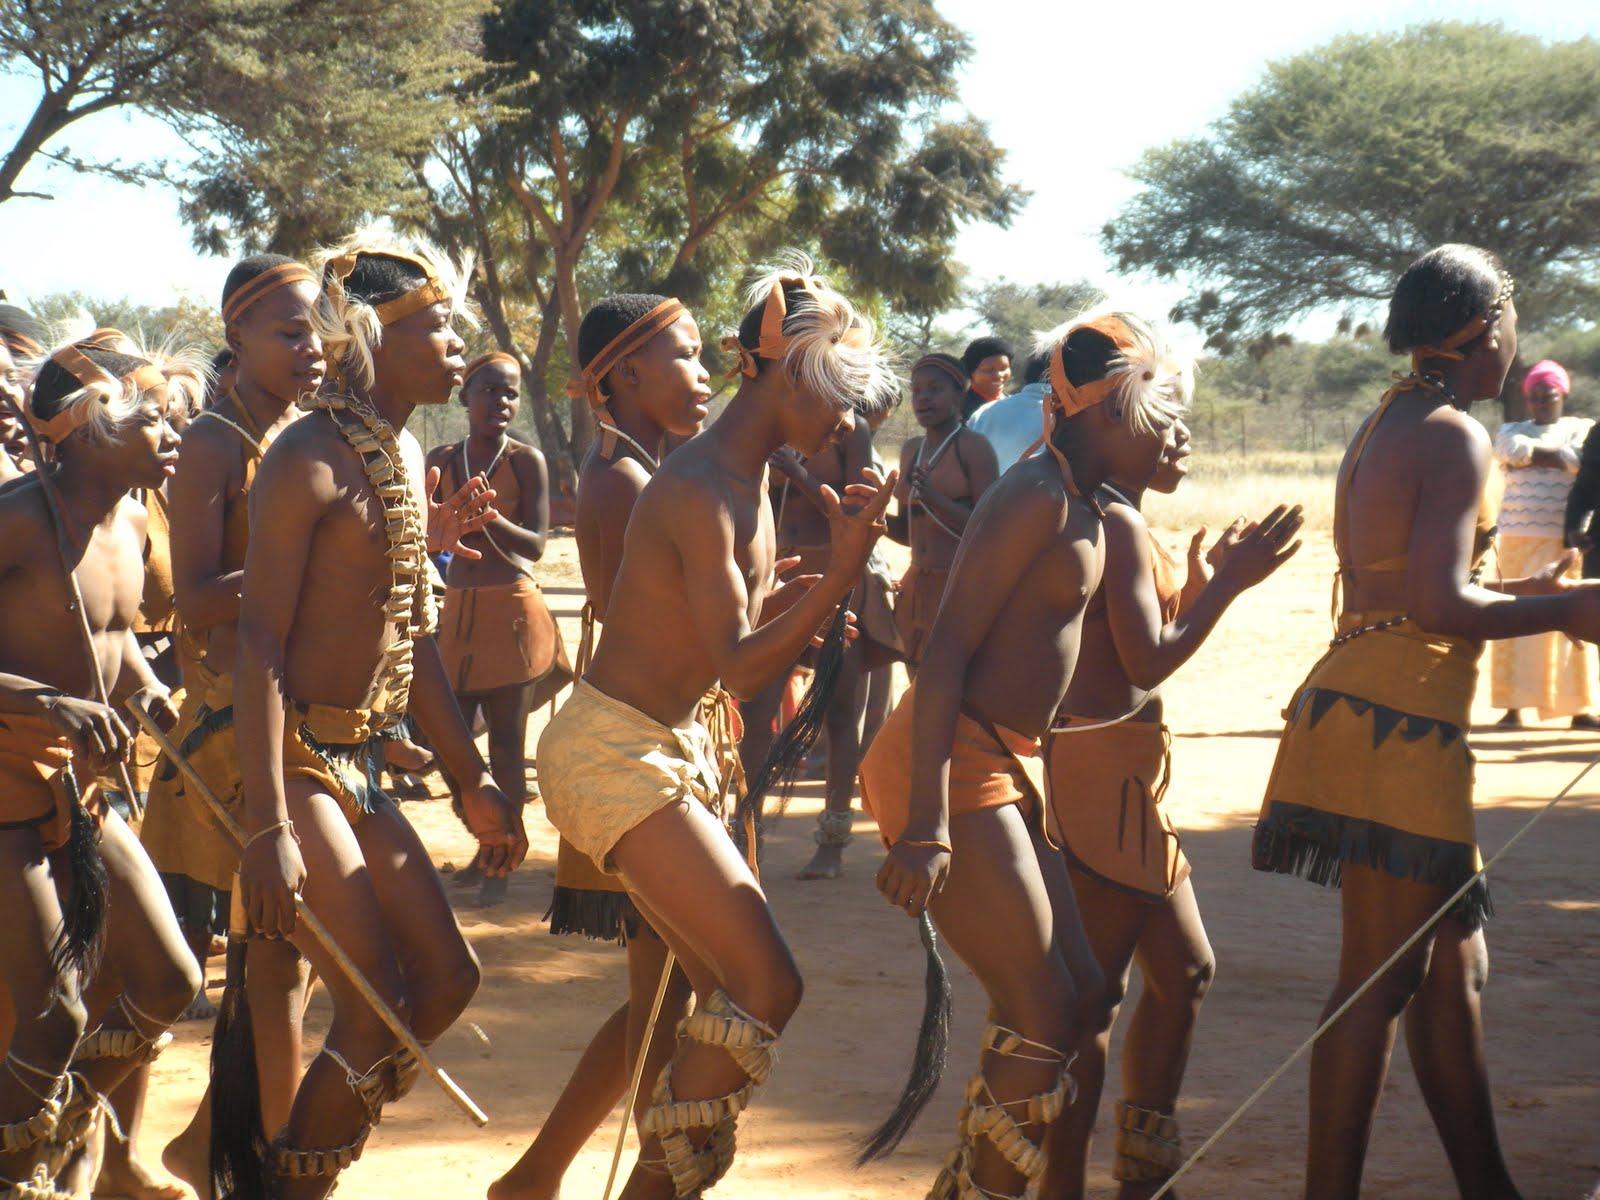 the tswana people The tswana (tswana: batswana, singular motswana) are a bantu-speaking ethnic group who are native to southern africathe tswana language belongs to the bantu group of the niger–congo languages.